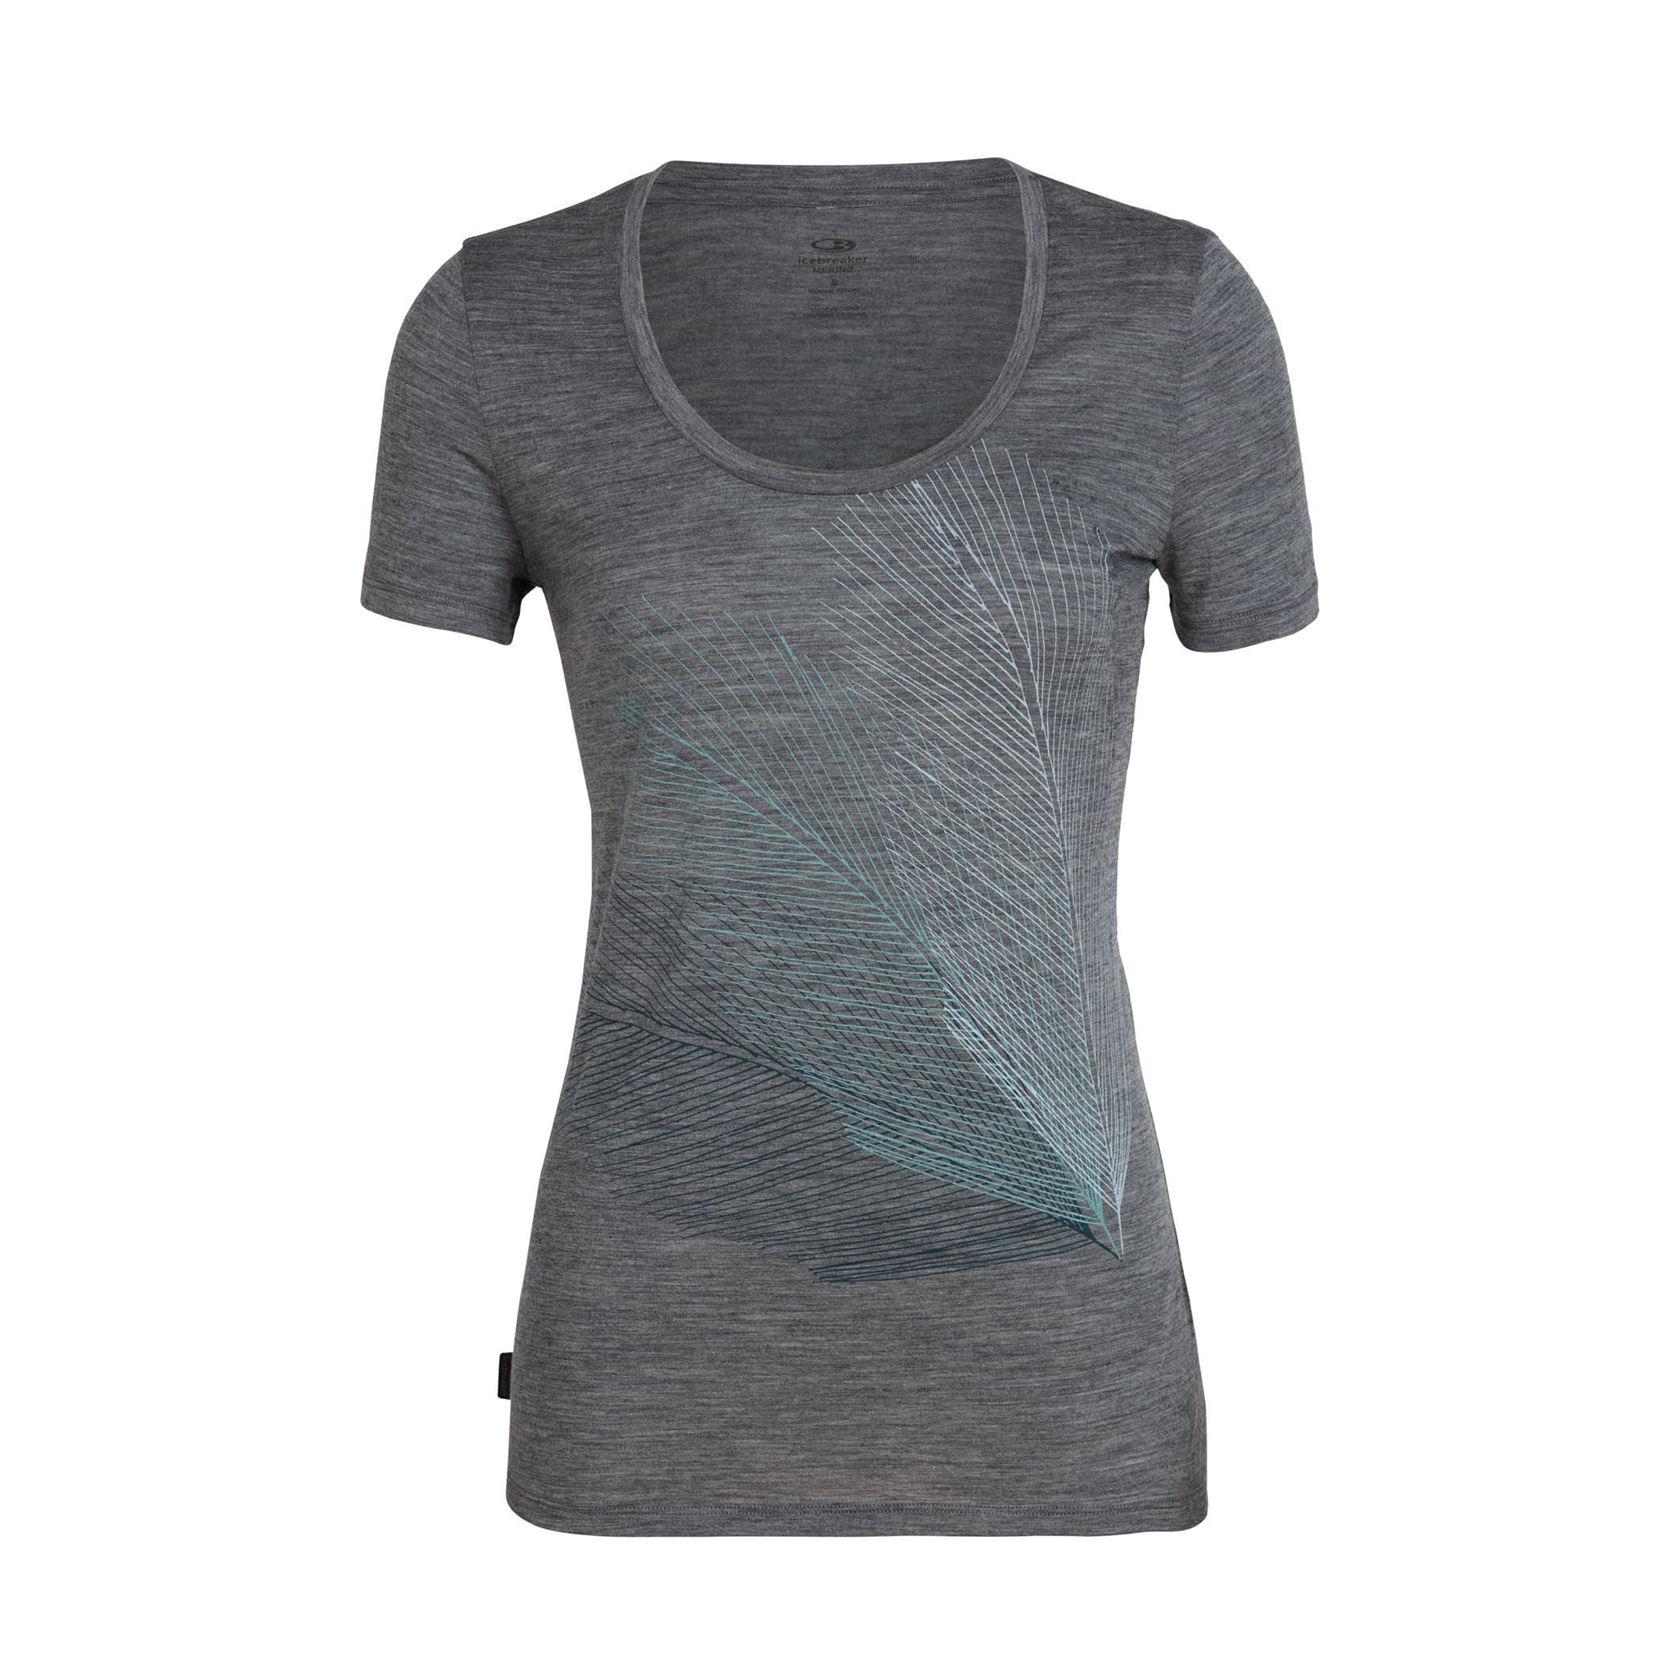 Plume Tech Lite Scoop Short Sleeve - Women's